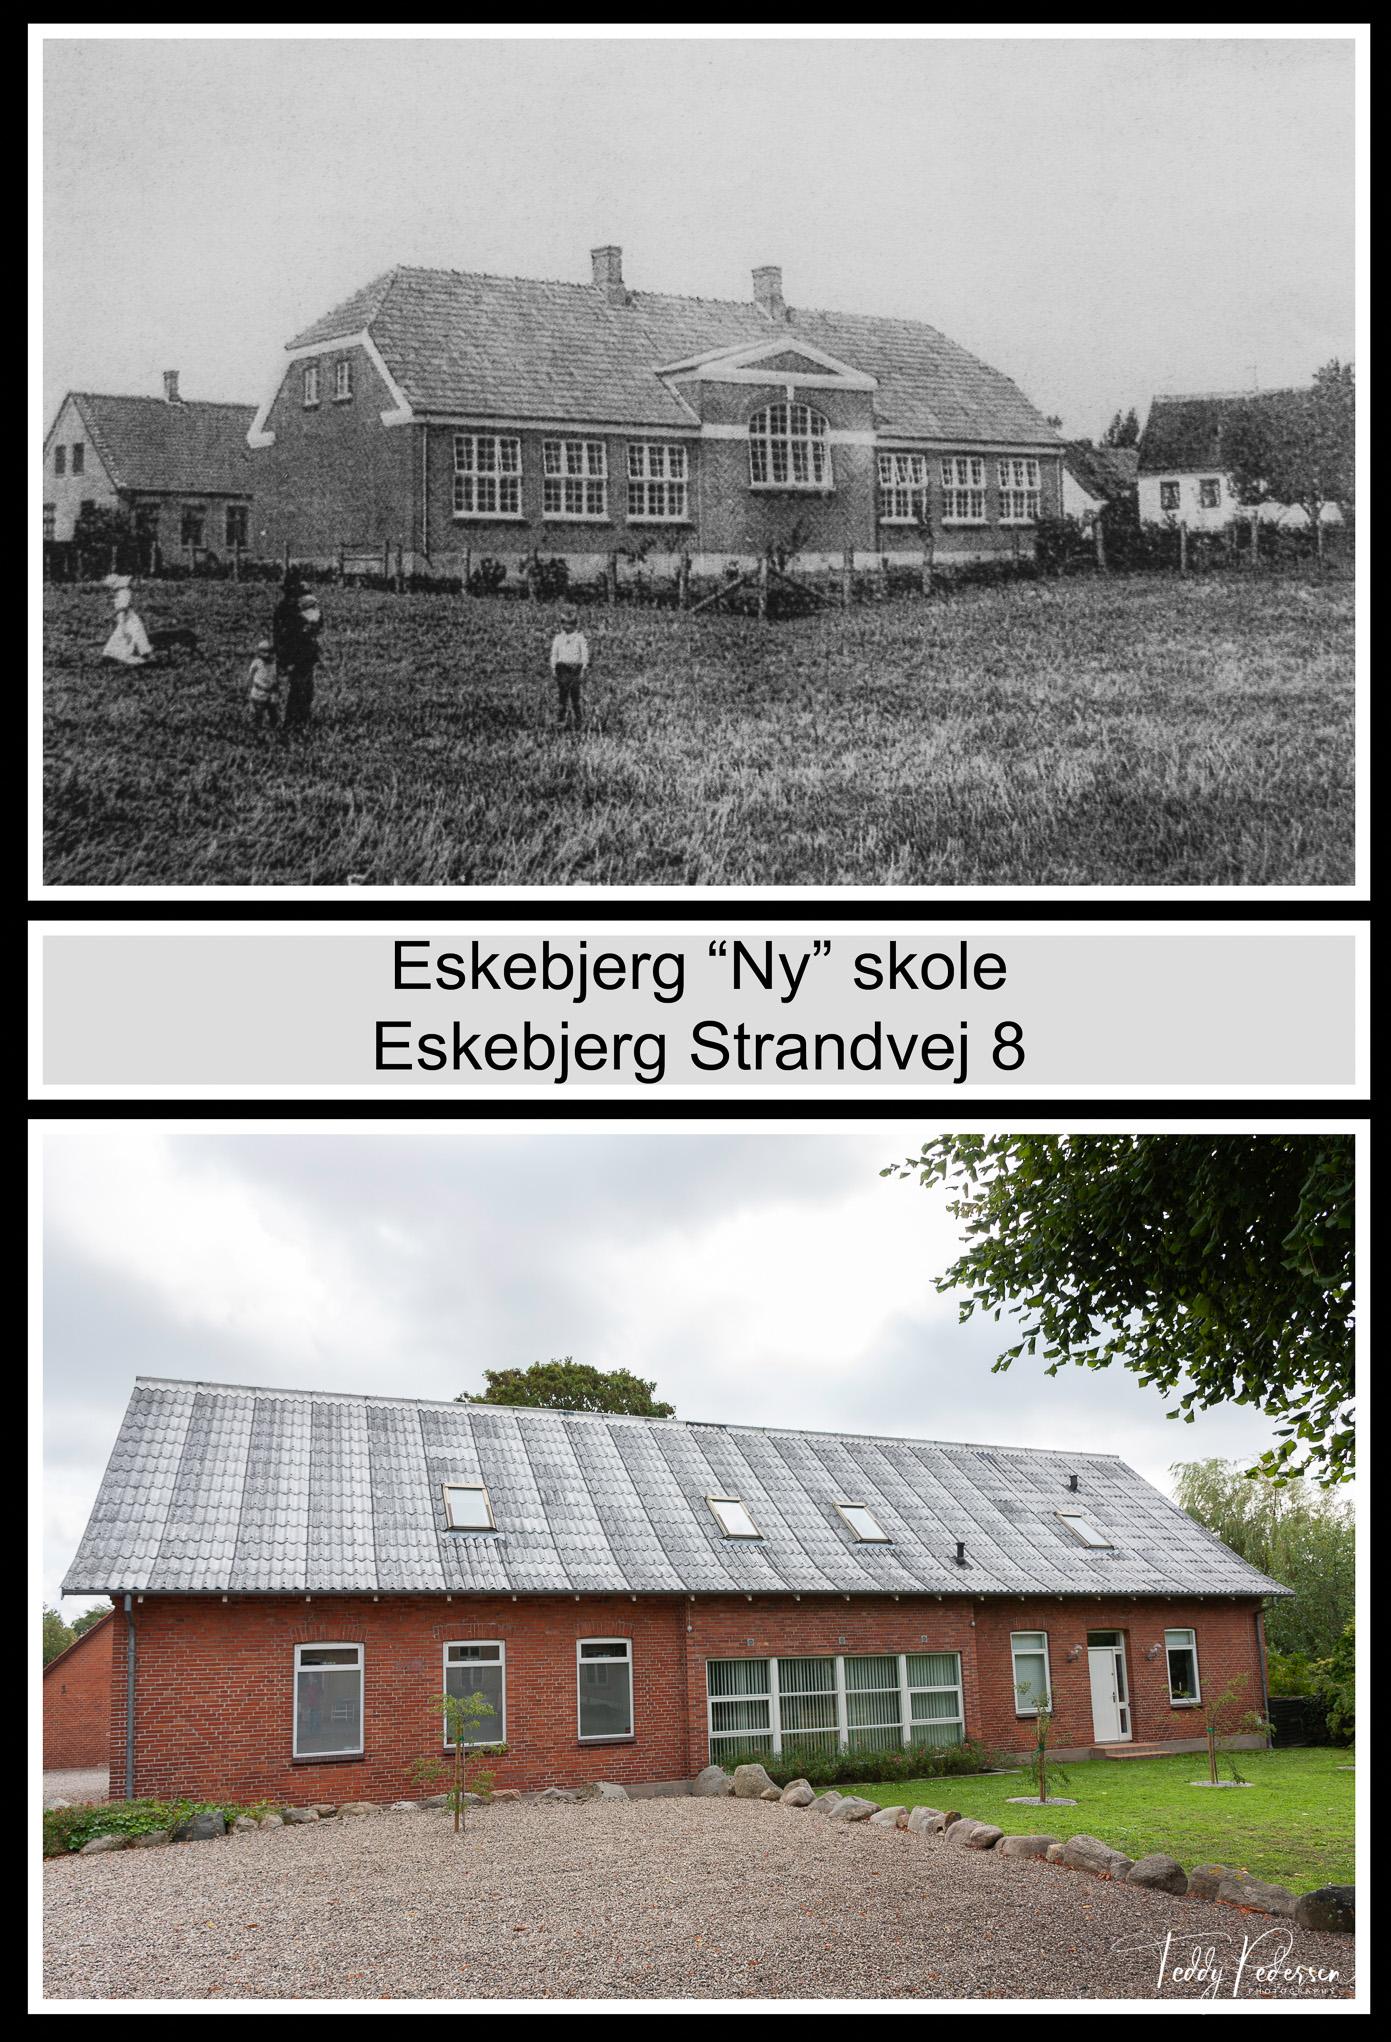 032-022-Eskebjerg-ny-skole_HighRes_LowRes